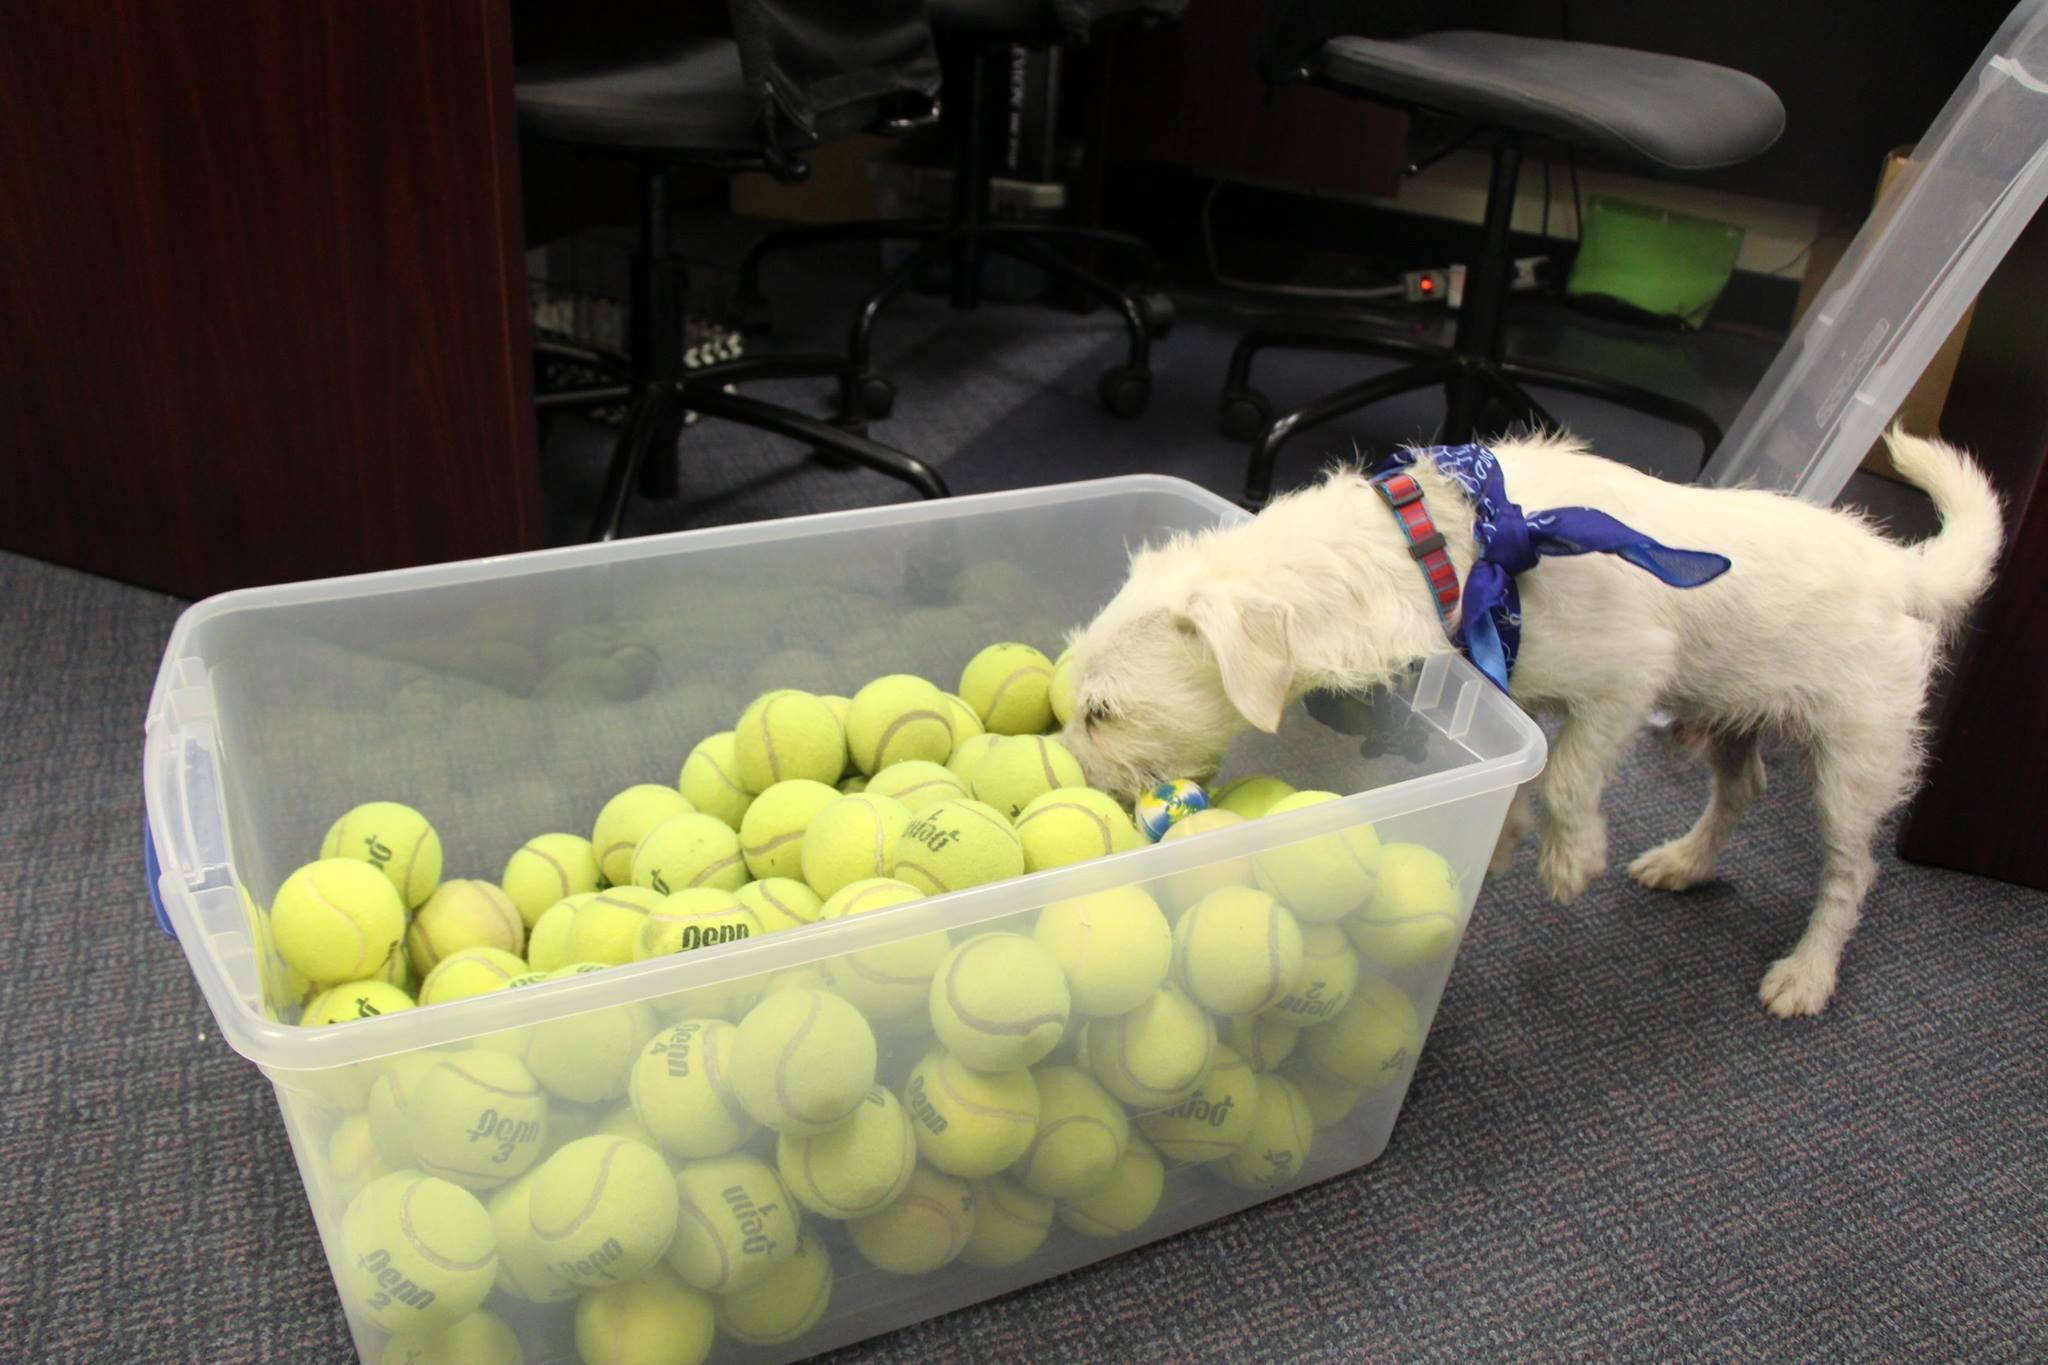 doantion tennis balls3.jpg